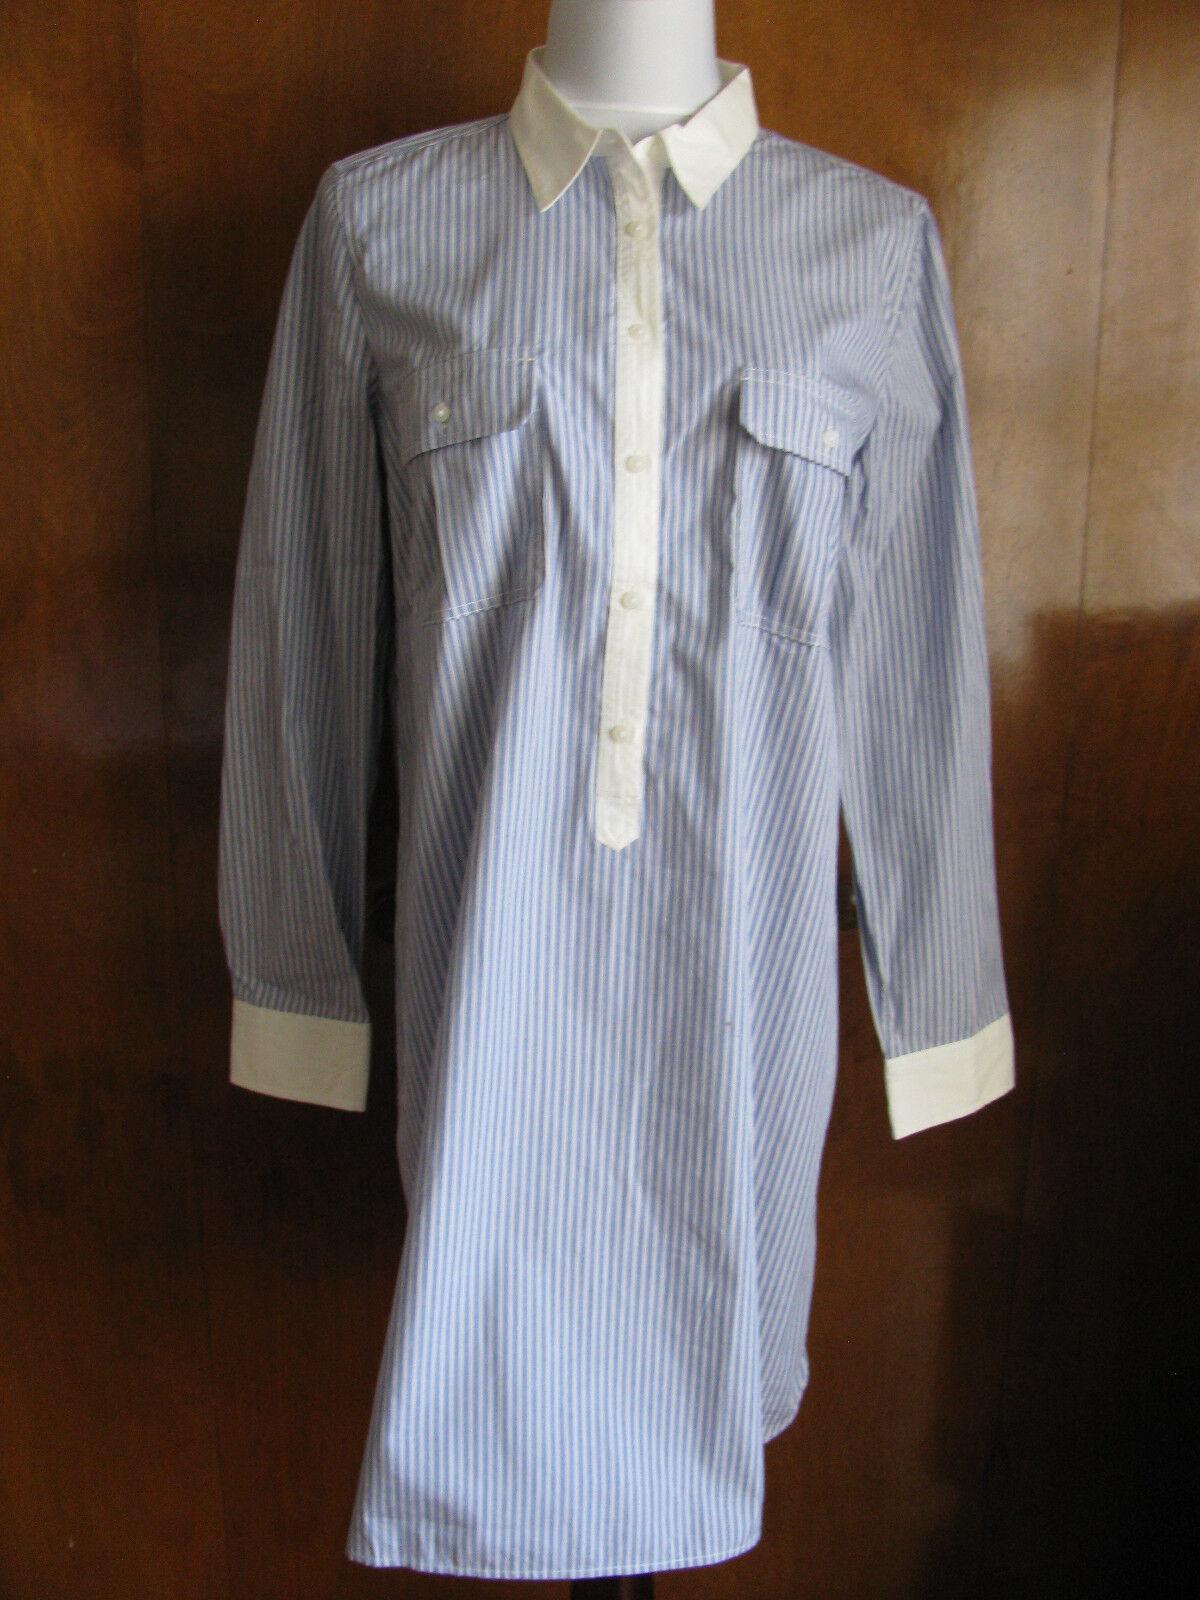 Gap damen Blau Weiß striped cotton pocketed shirt dress Größe S L NWT